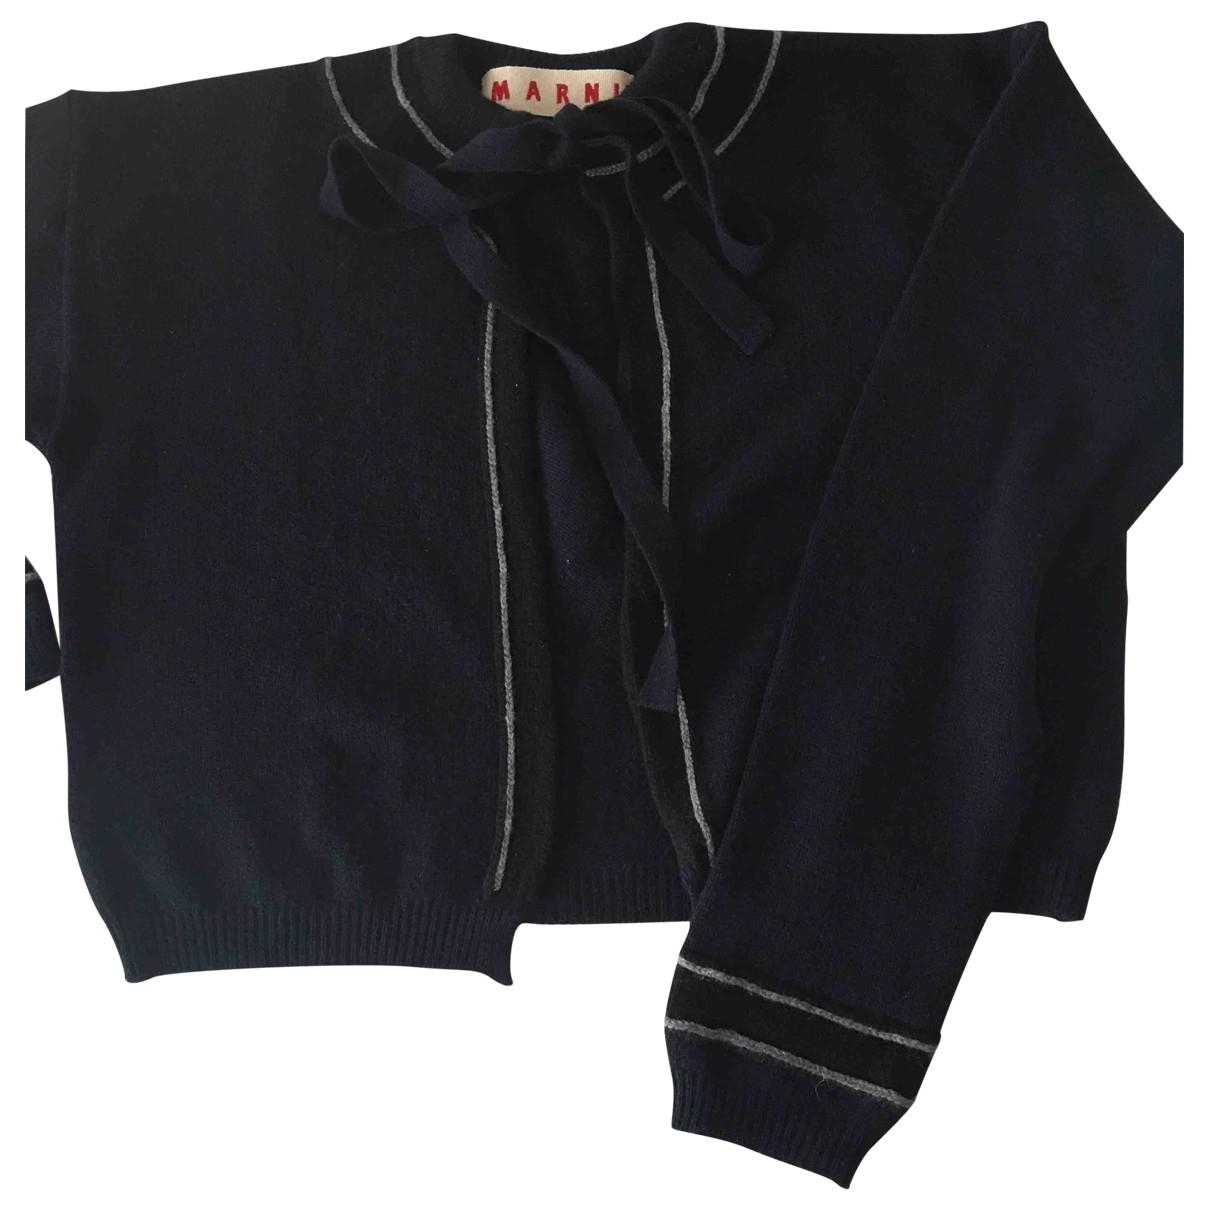 Marni \N Pullover in  Grau Kaschmir